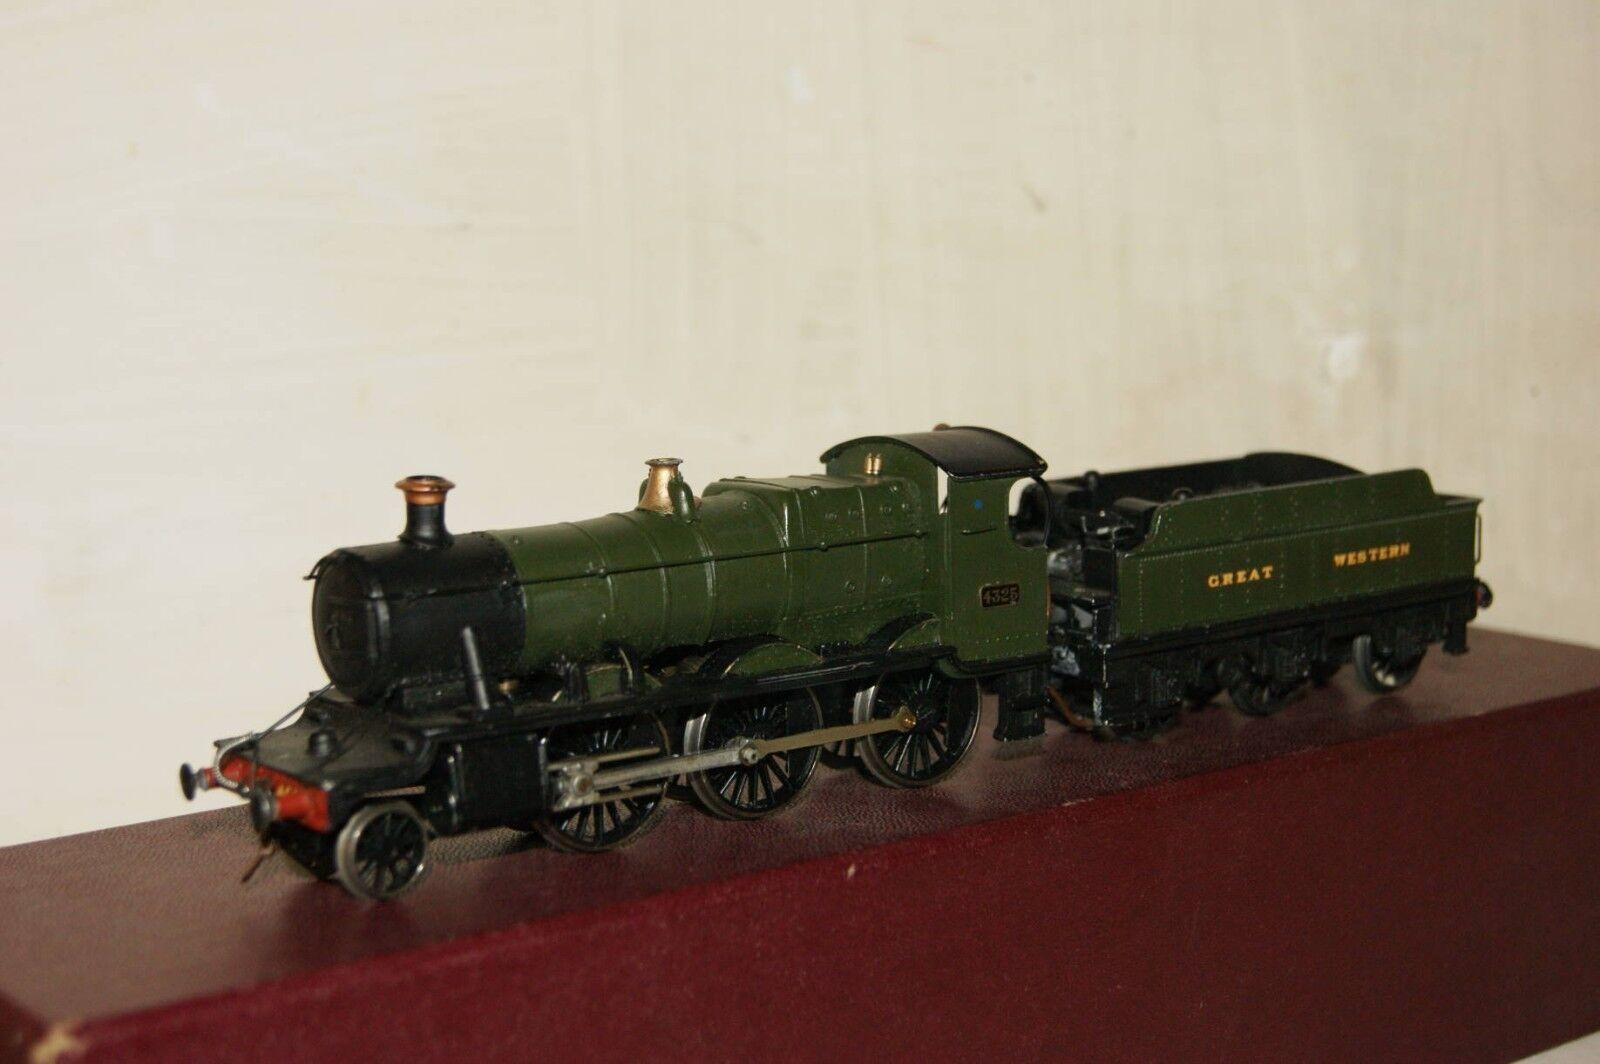 OO gauge KITBUILT Mogul 2-6-0 GWR verde Livery '4325' NICELY DETAILED